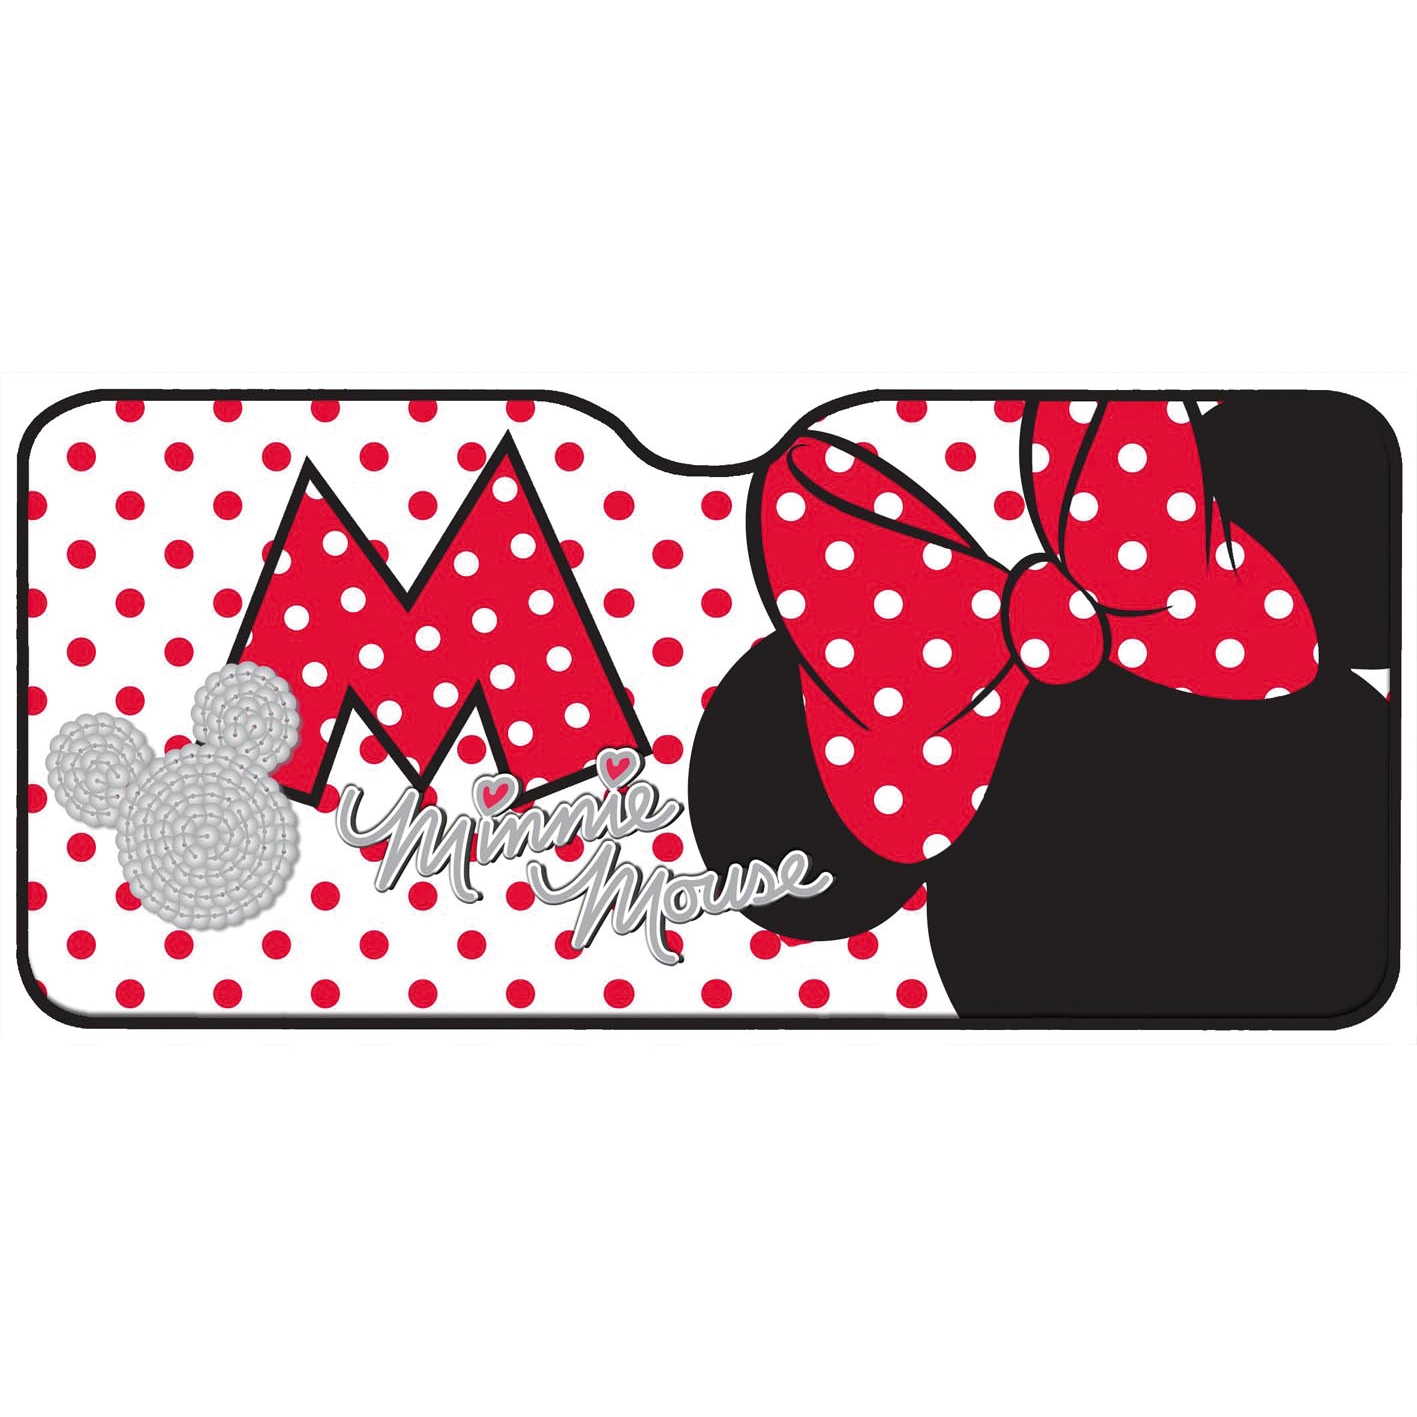 Parasolar pentru parbriz Minnie Disney Eurasia 26061